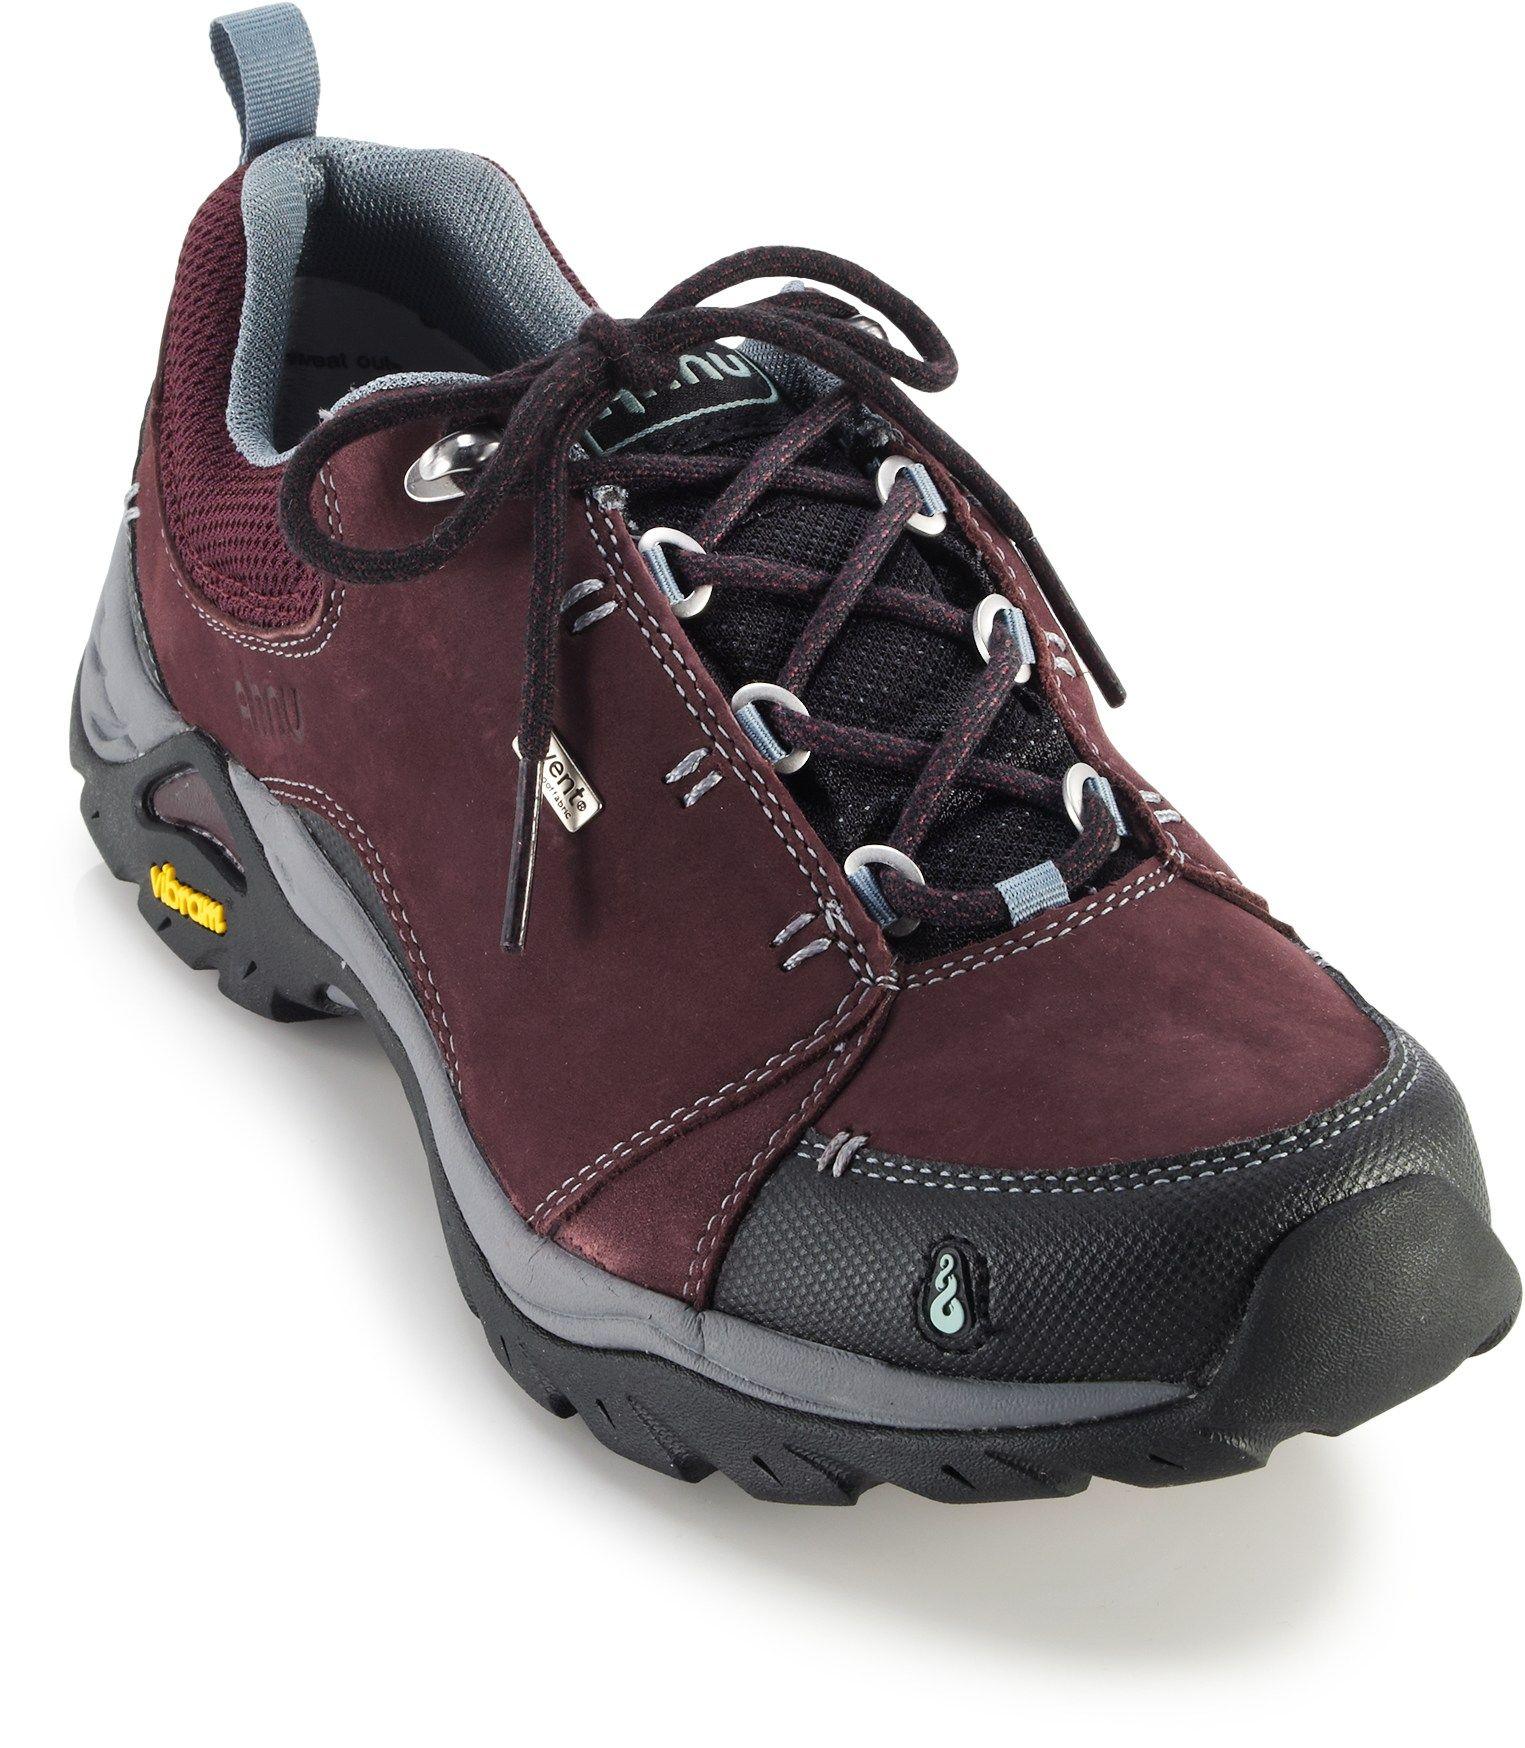 Ahnu Montara II Waterproof Hiking Shoes